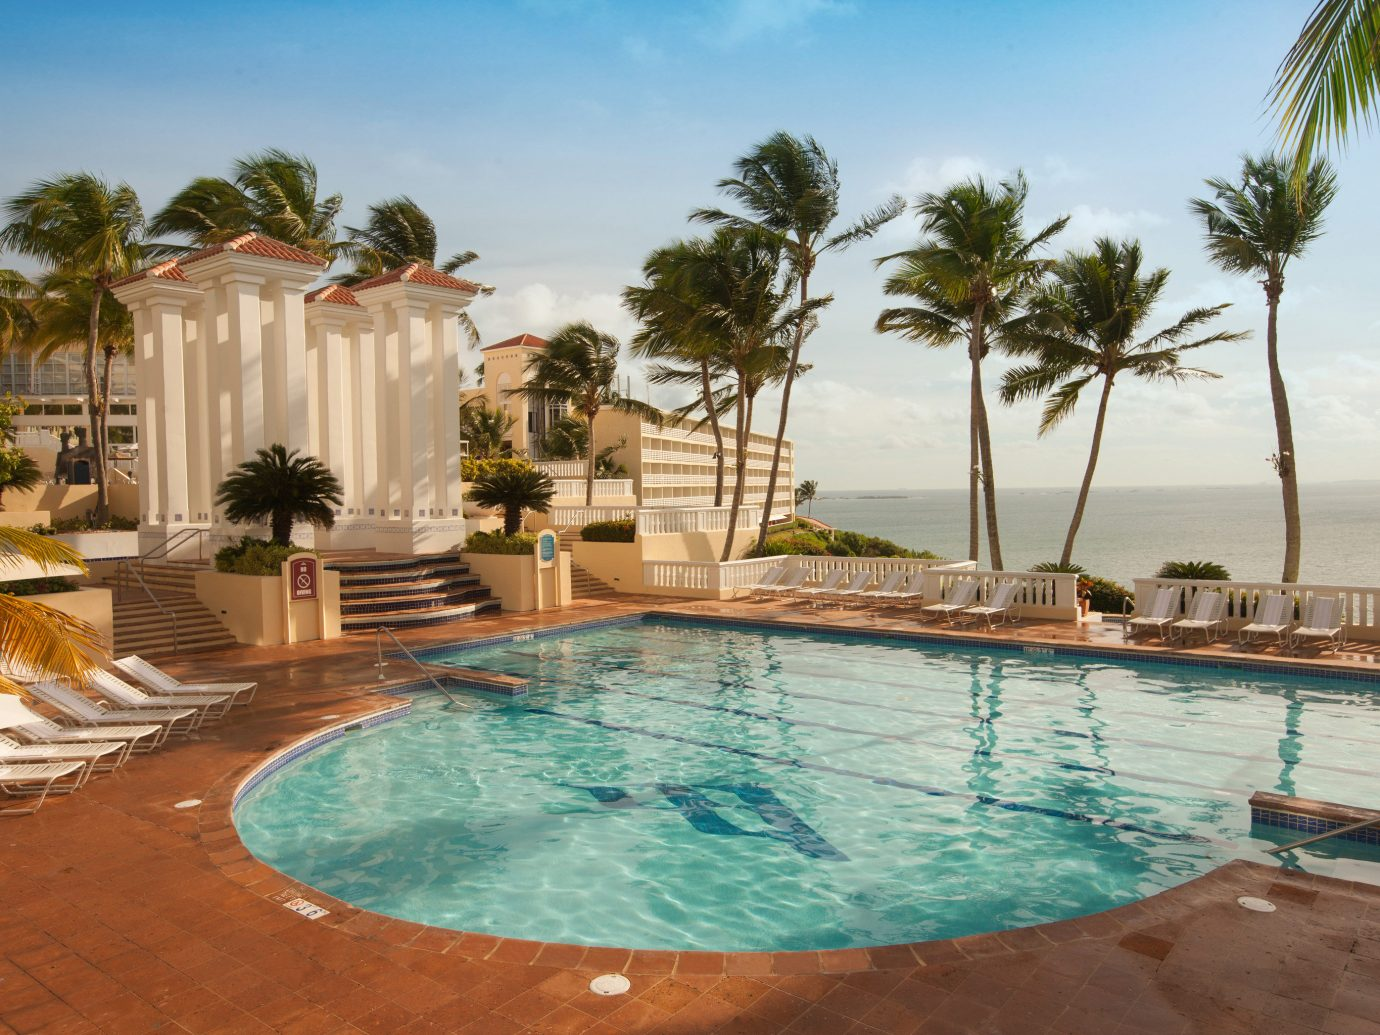 Hotels sky outdoor swimming pool Resort property vacation estate Pool Villa caribbean backyard real estate hacienda Lagoon palm swimming